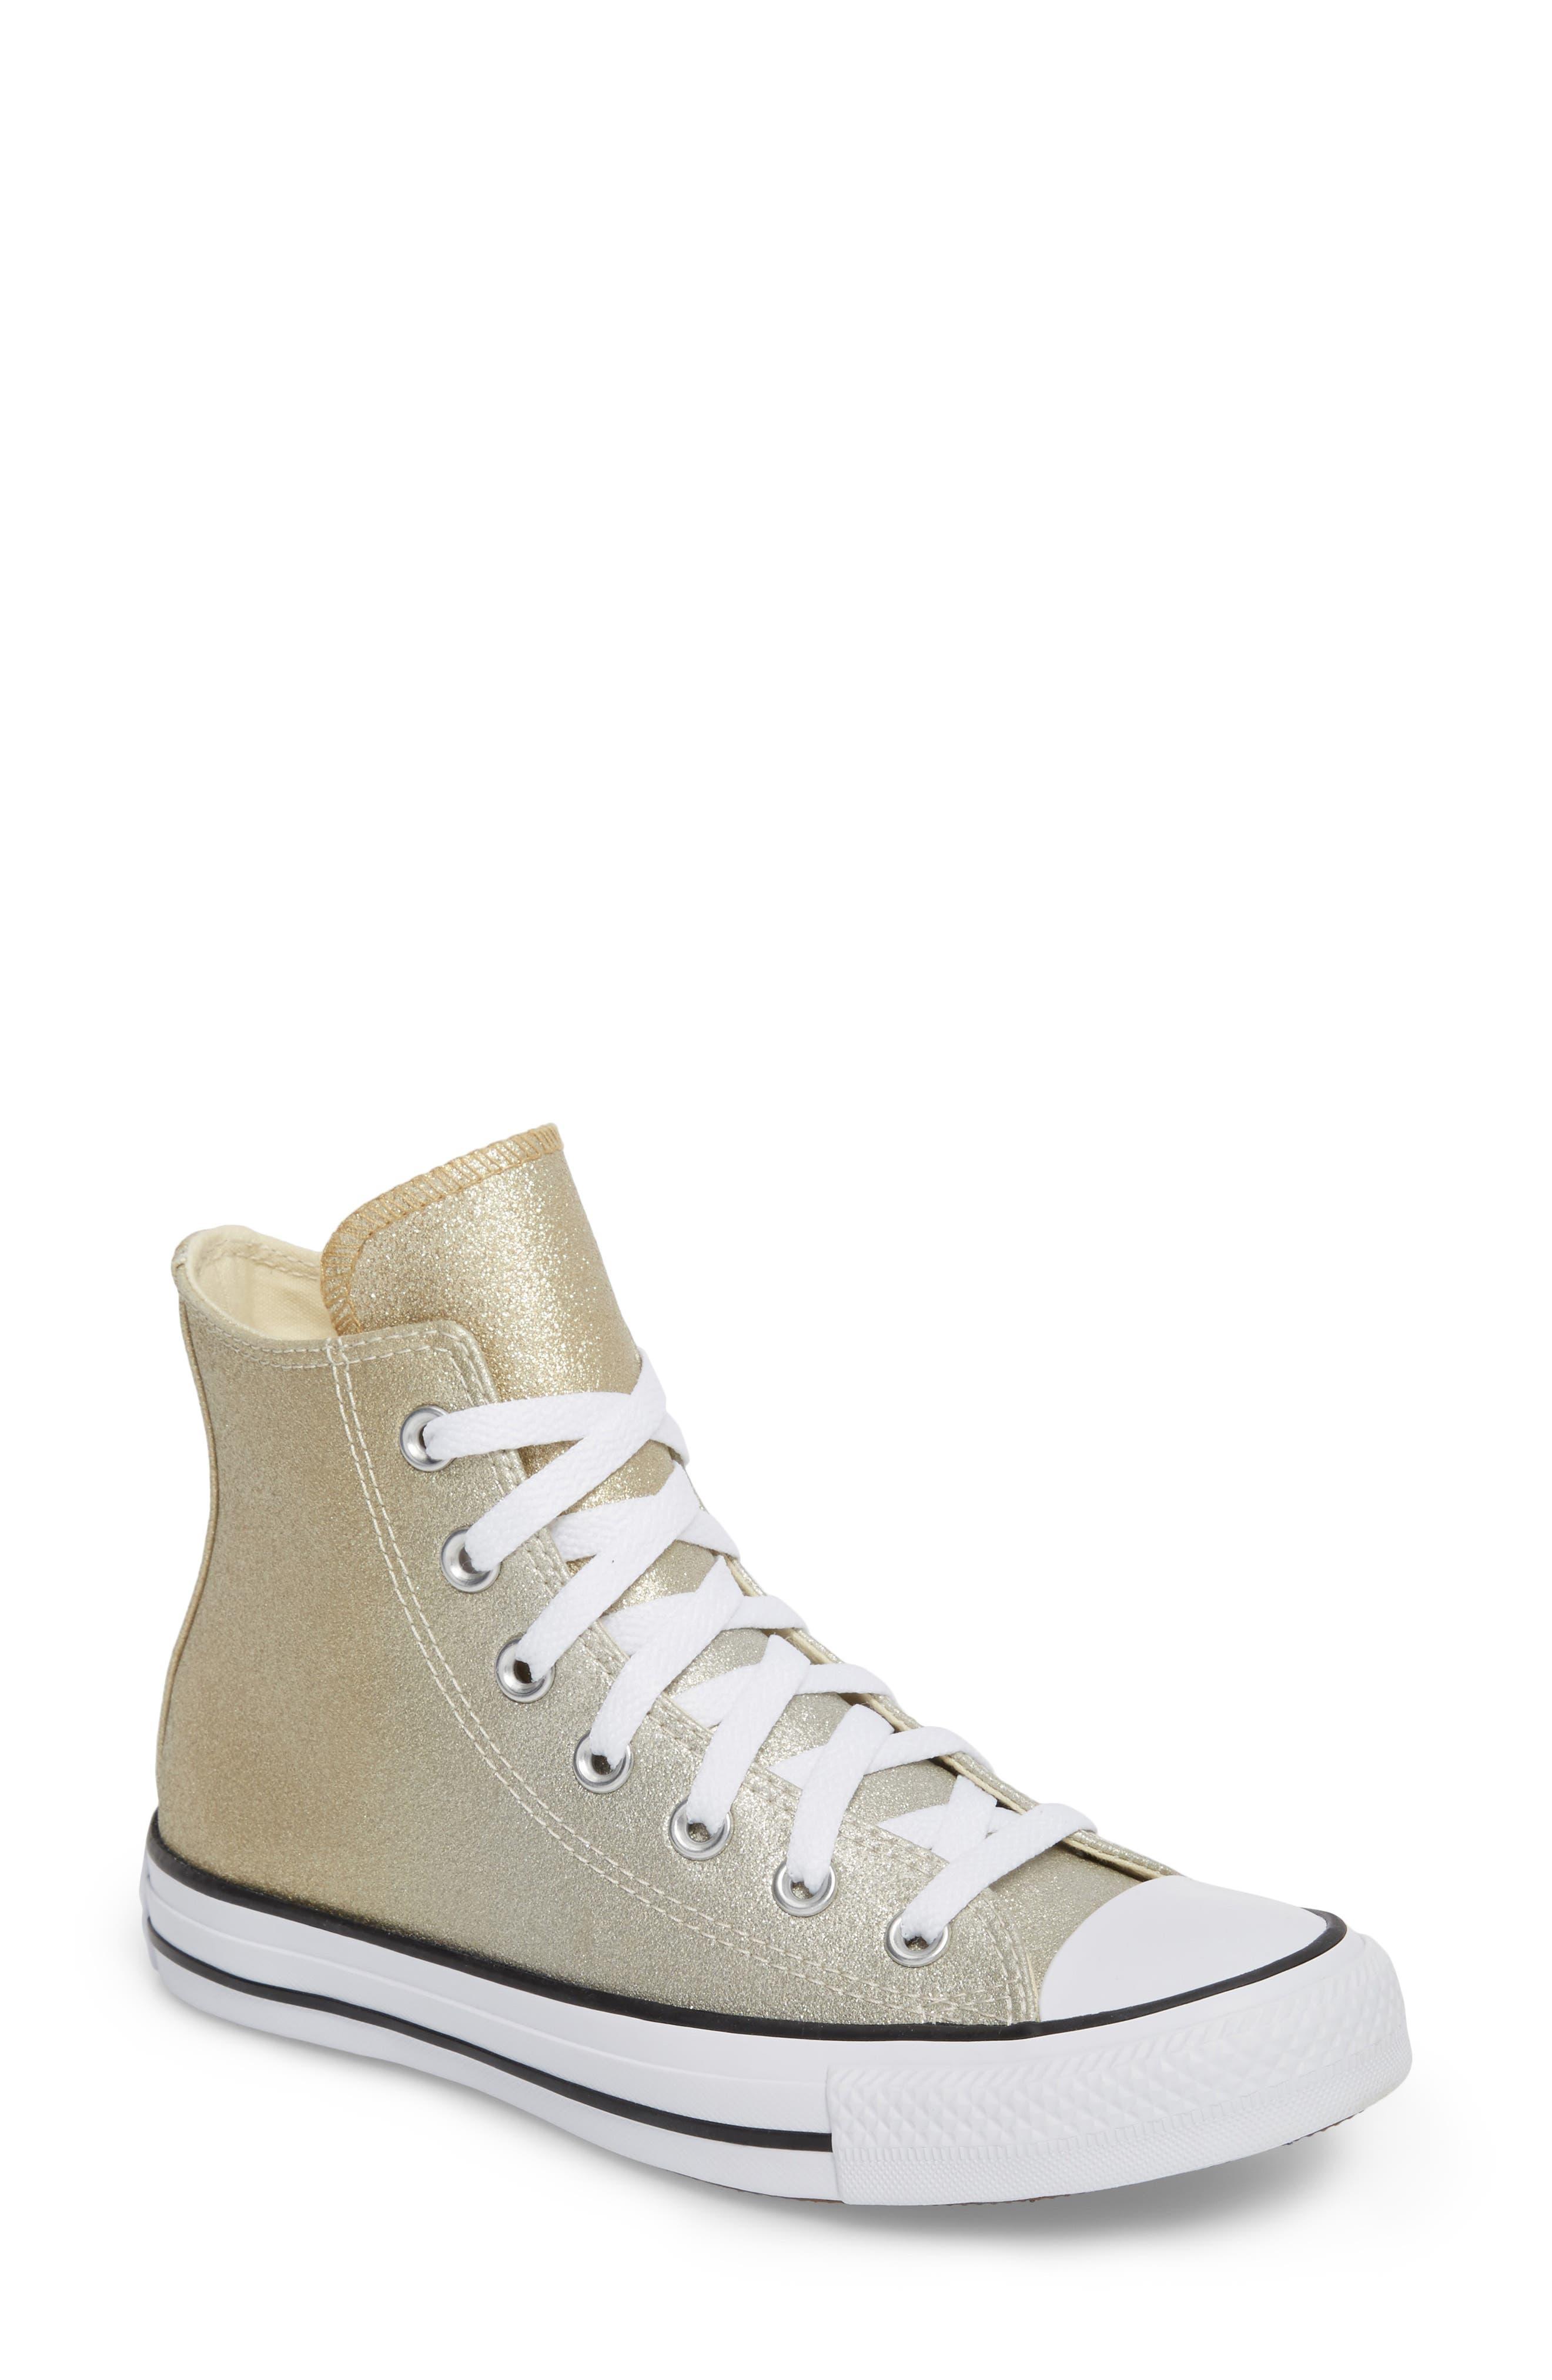 Chuck Taylor<sup>®</sup> All Star<sup>®</sup> Ombré Metallic High Top Sneaker,                             Main thumbnail 1, color,                             Light Gold